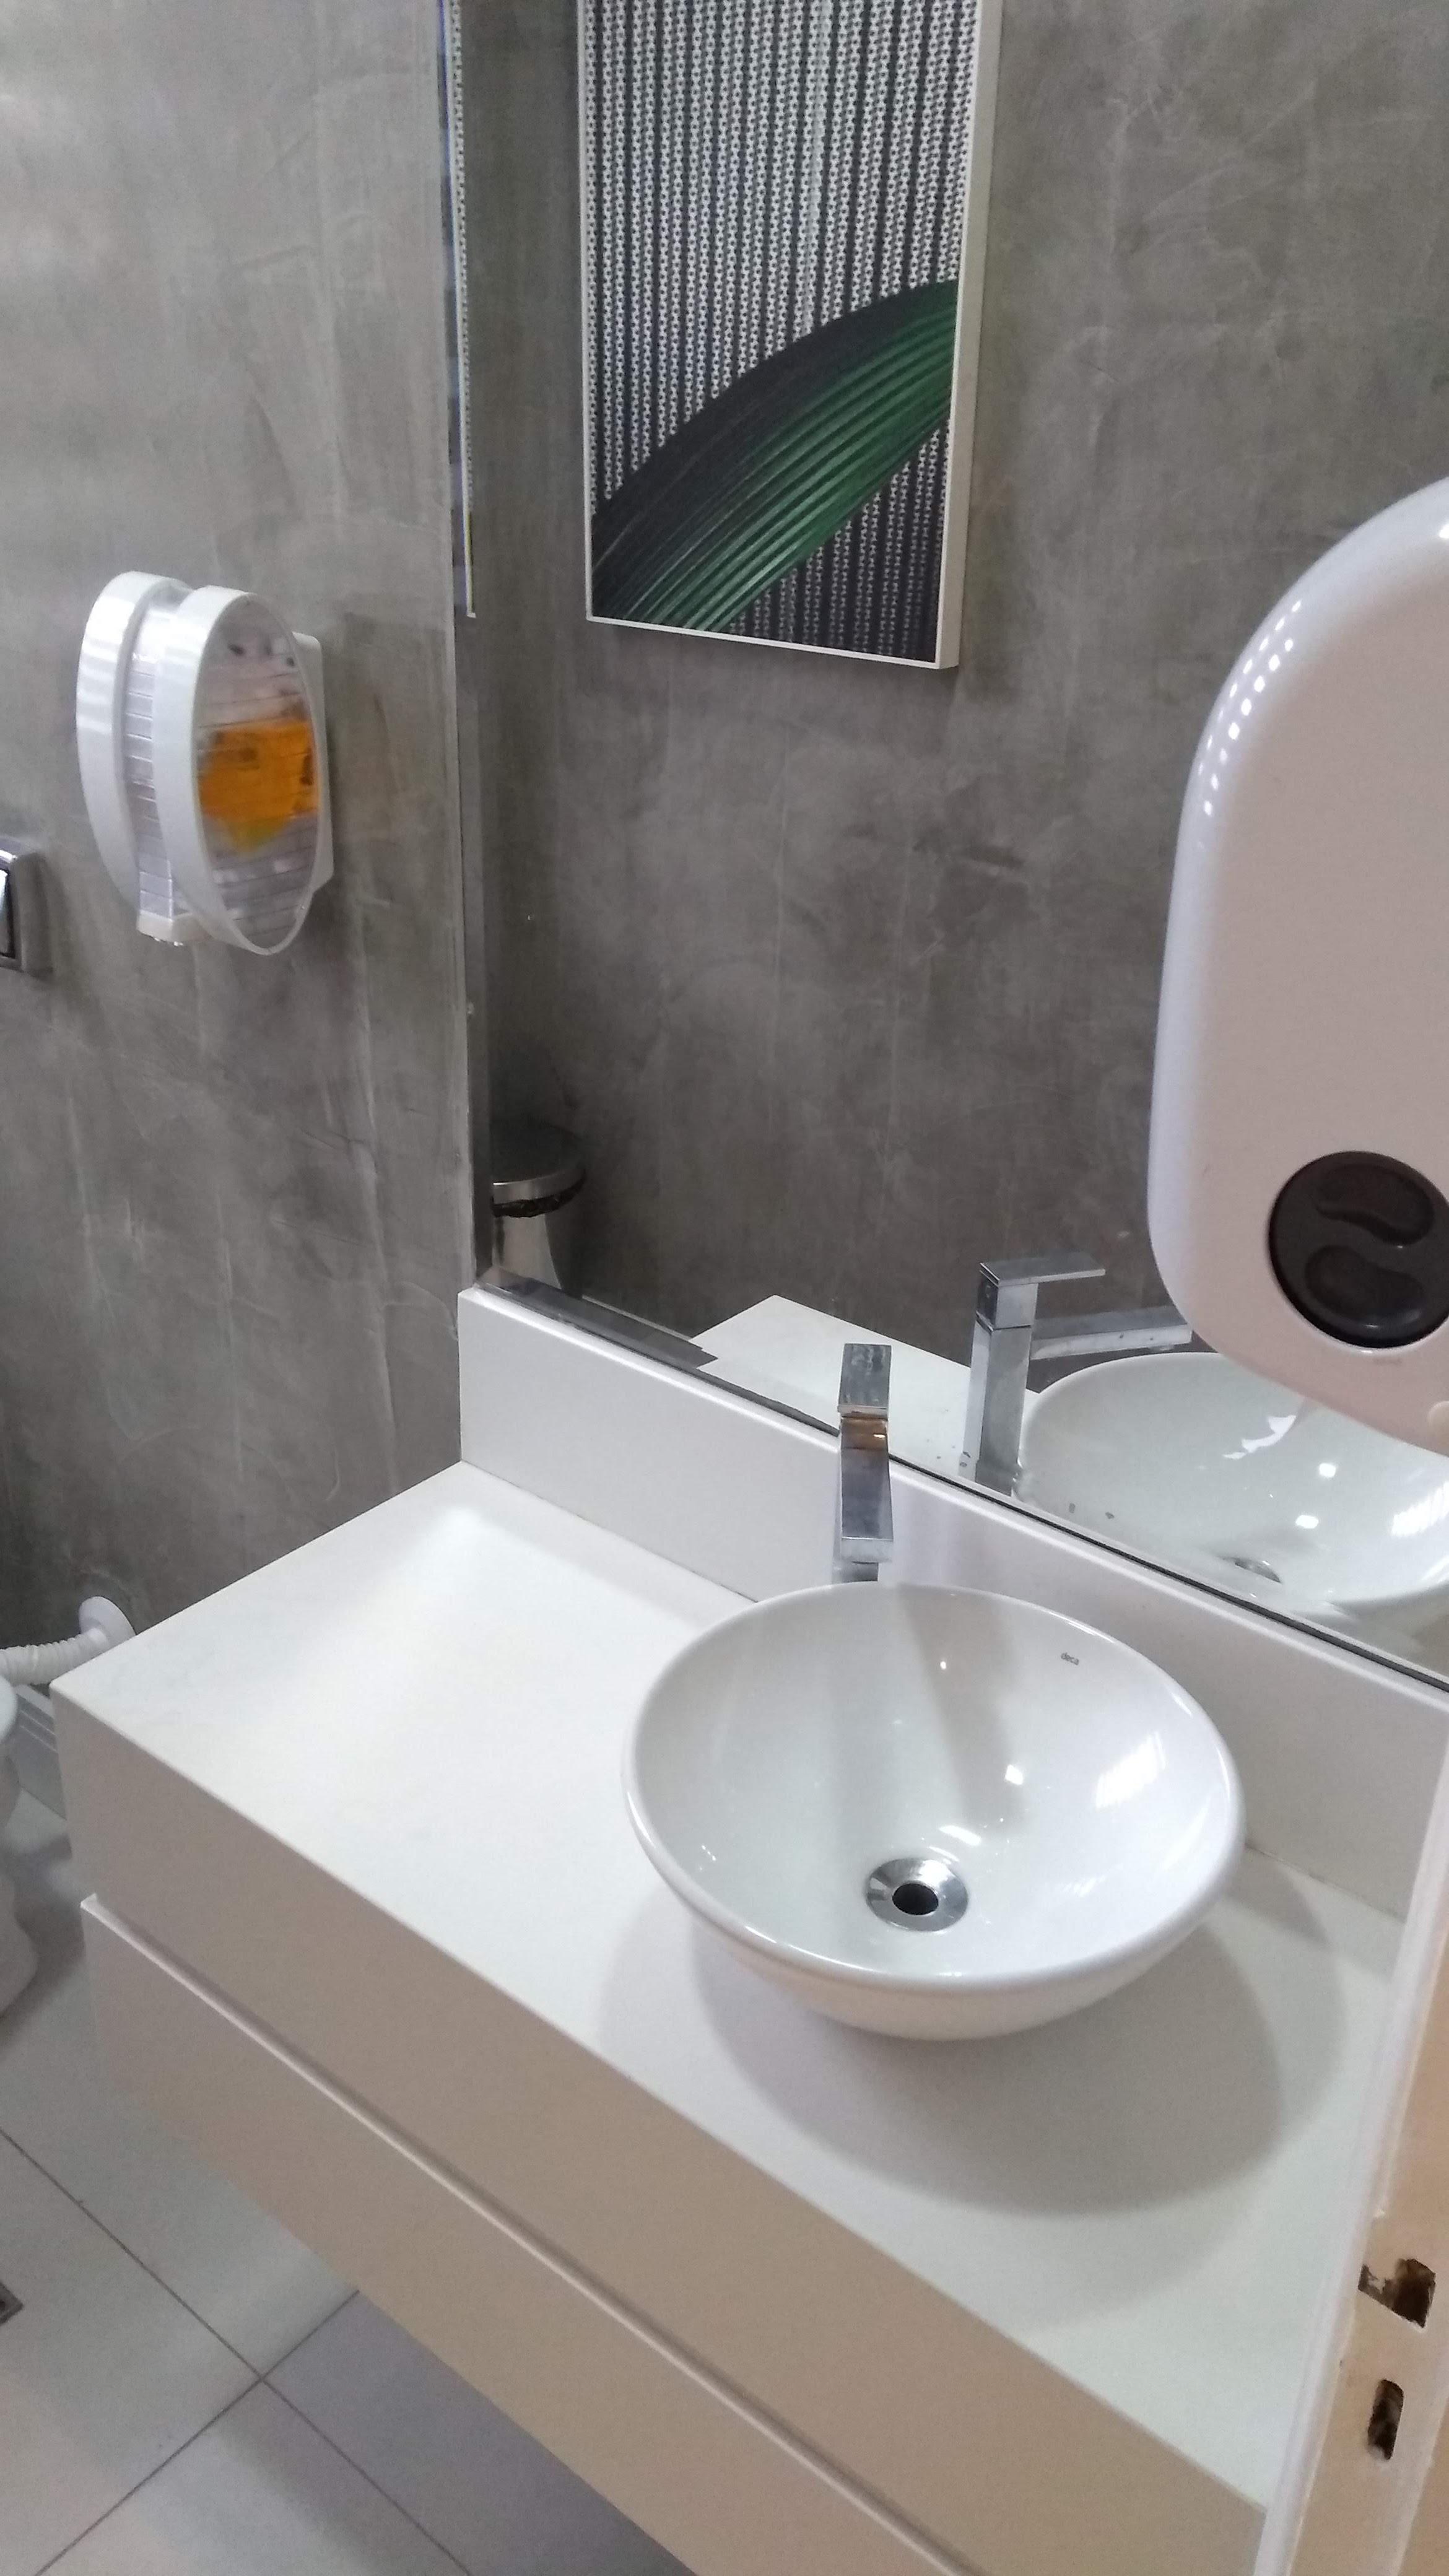 Clínica Endonette - Banheiro